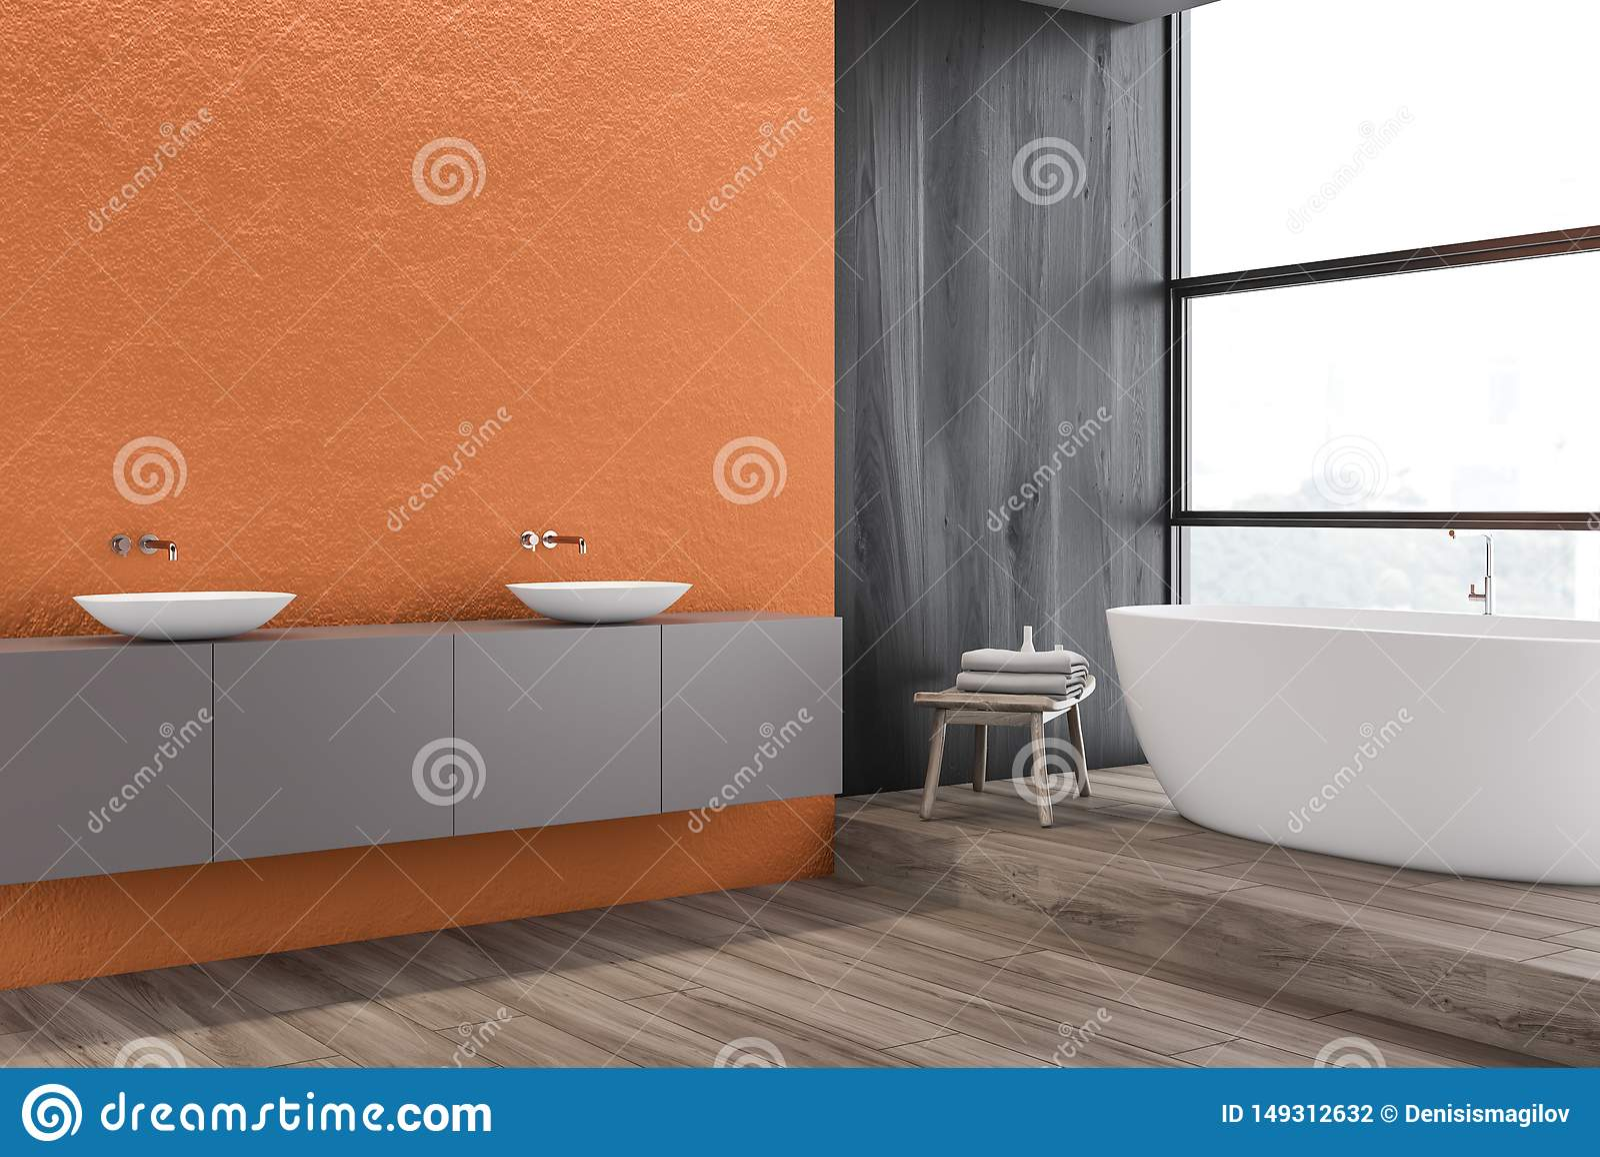 Orange Bathroom Corner Double Sink And Tub Stock Illustration